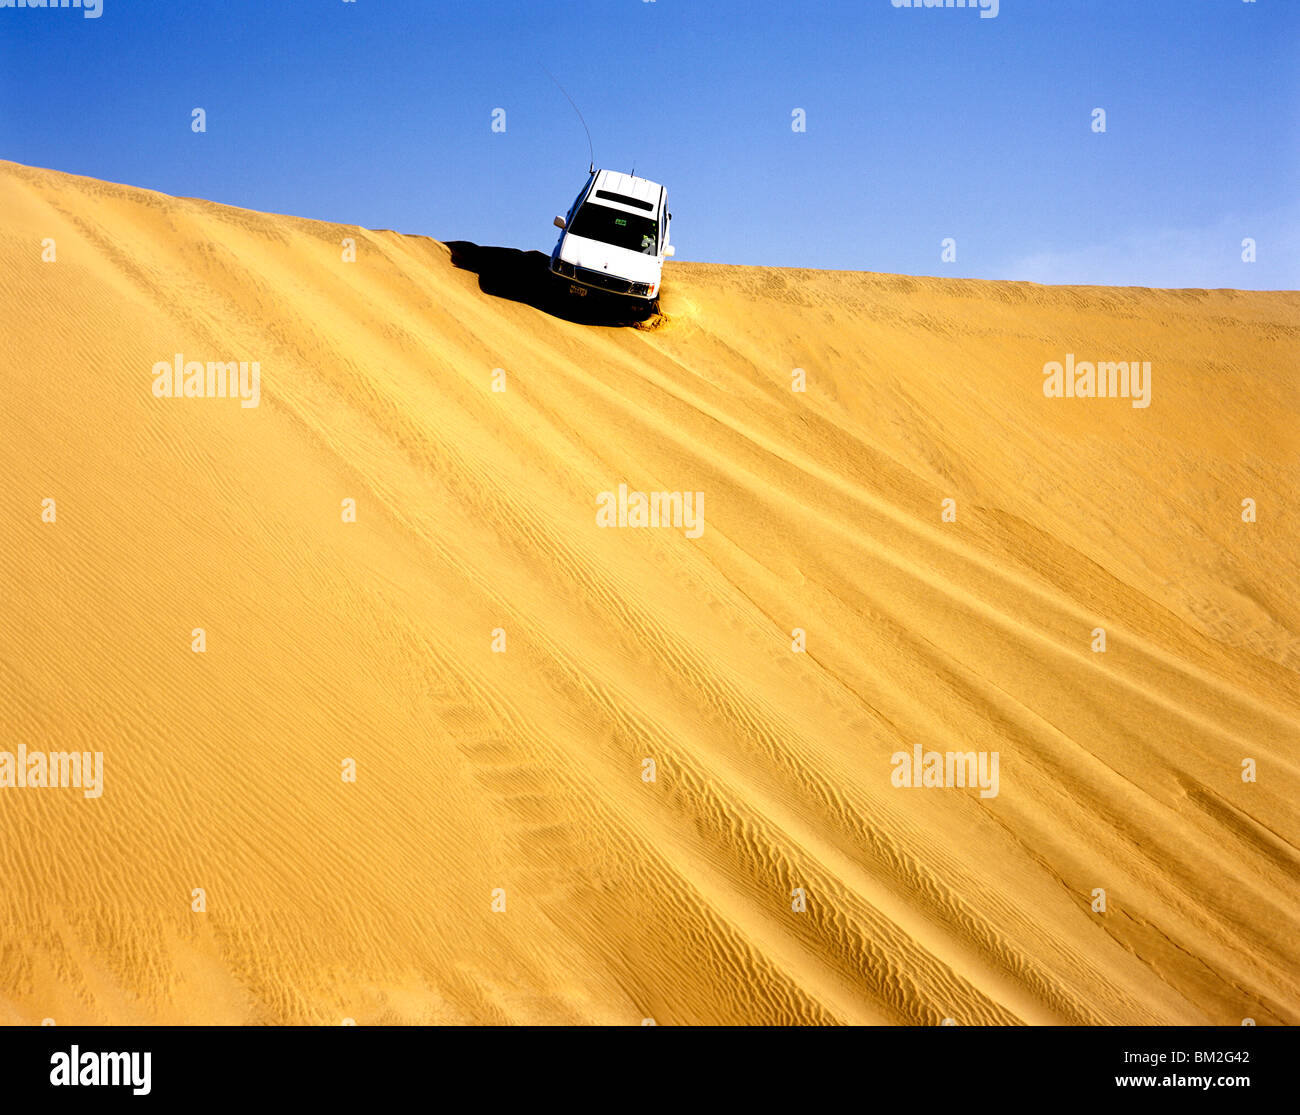 Desert Qatar Stock Photos & Desert Qatar Stock Images - Alamy